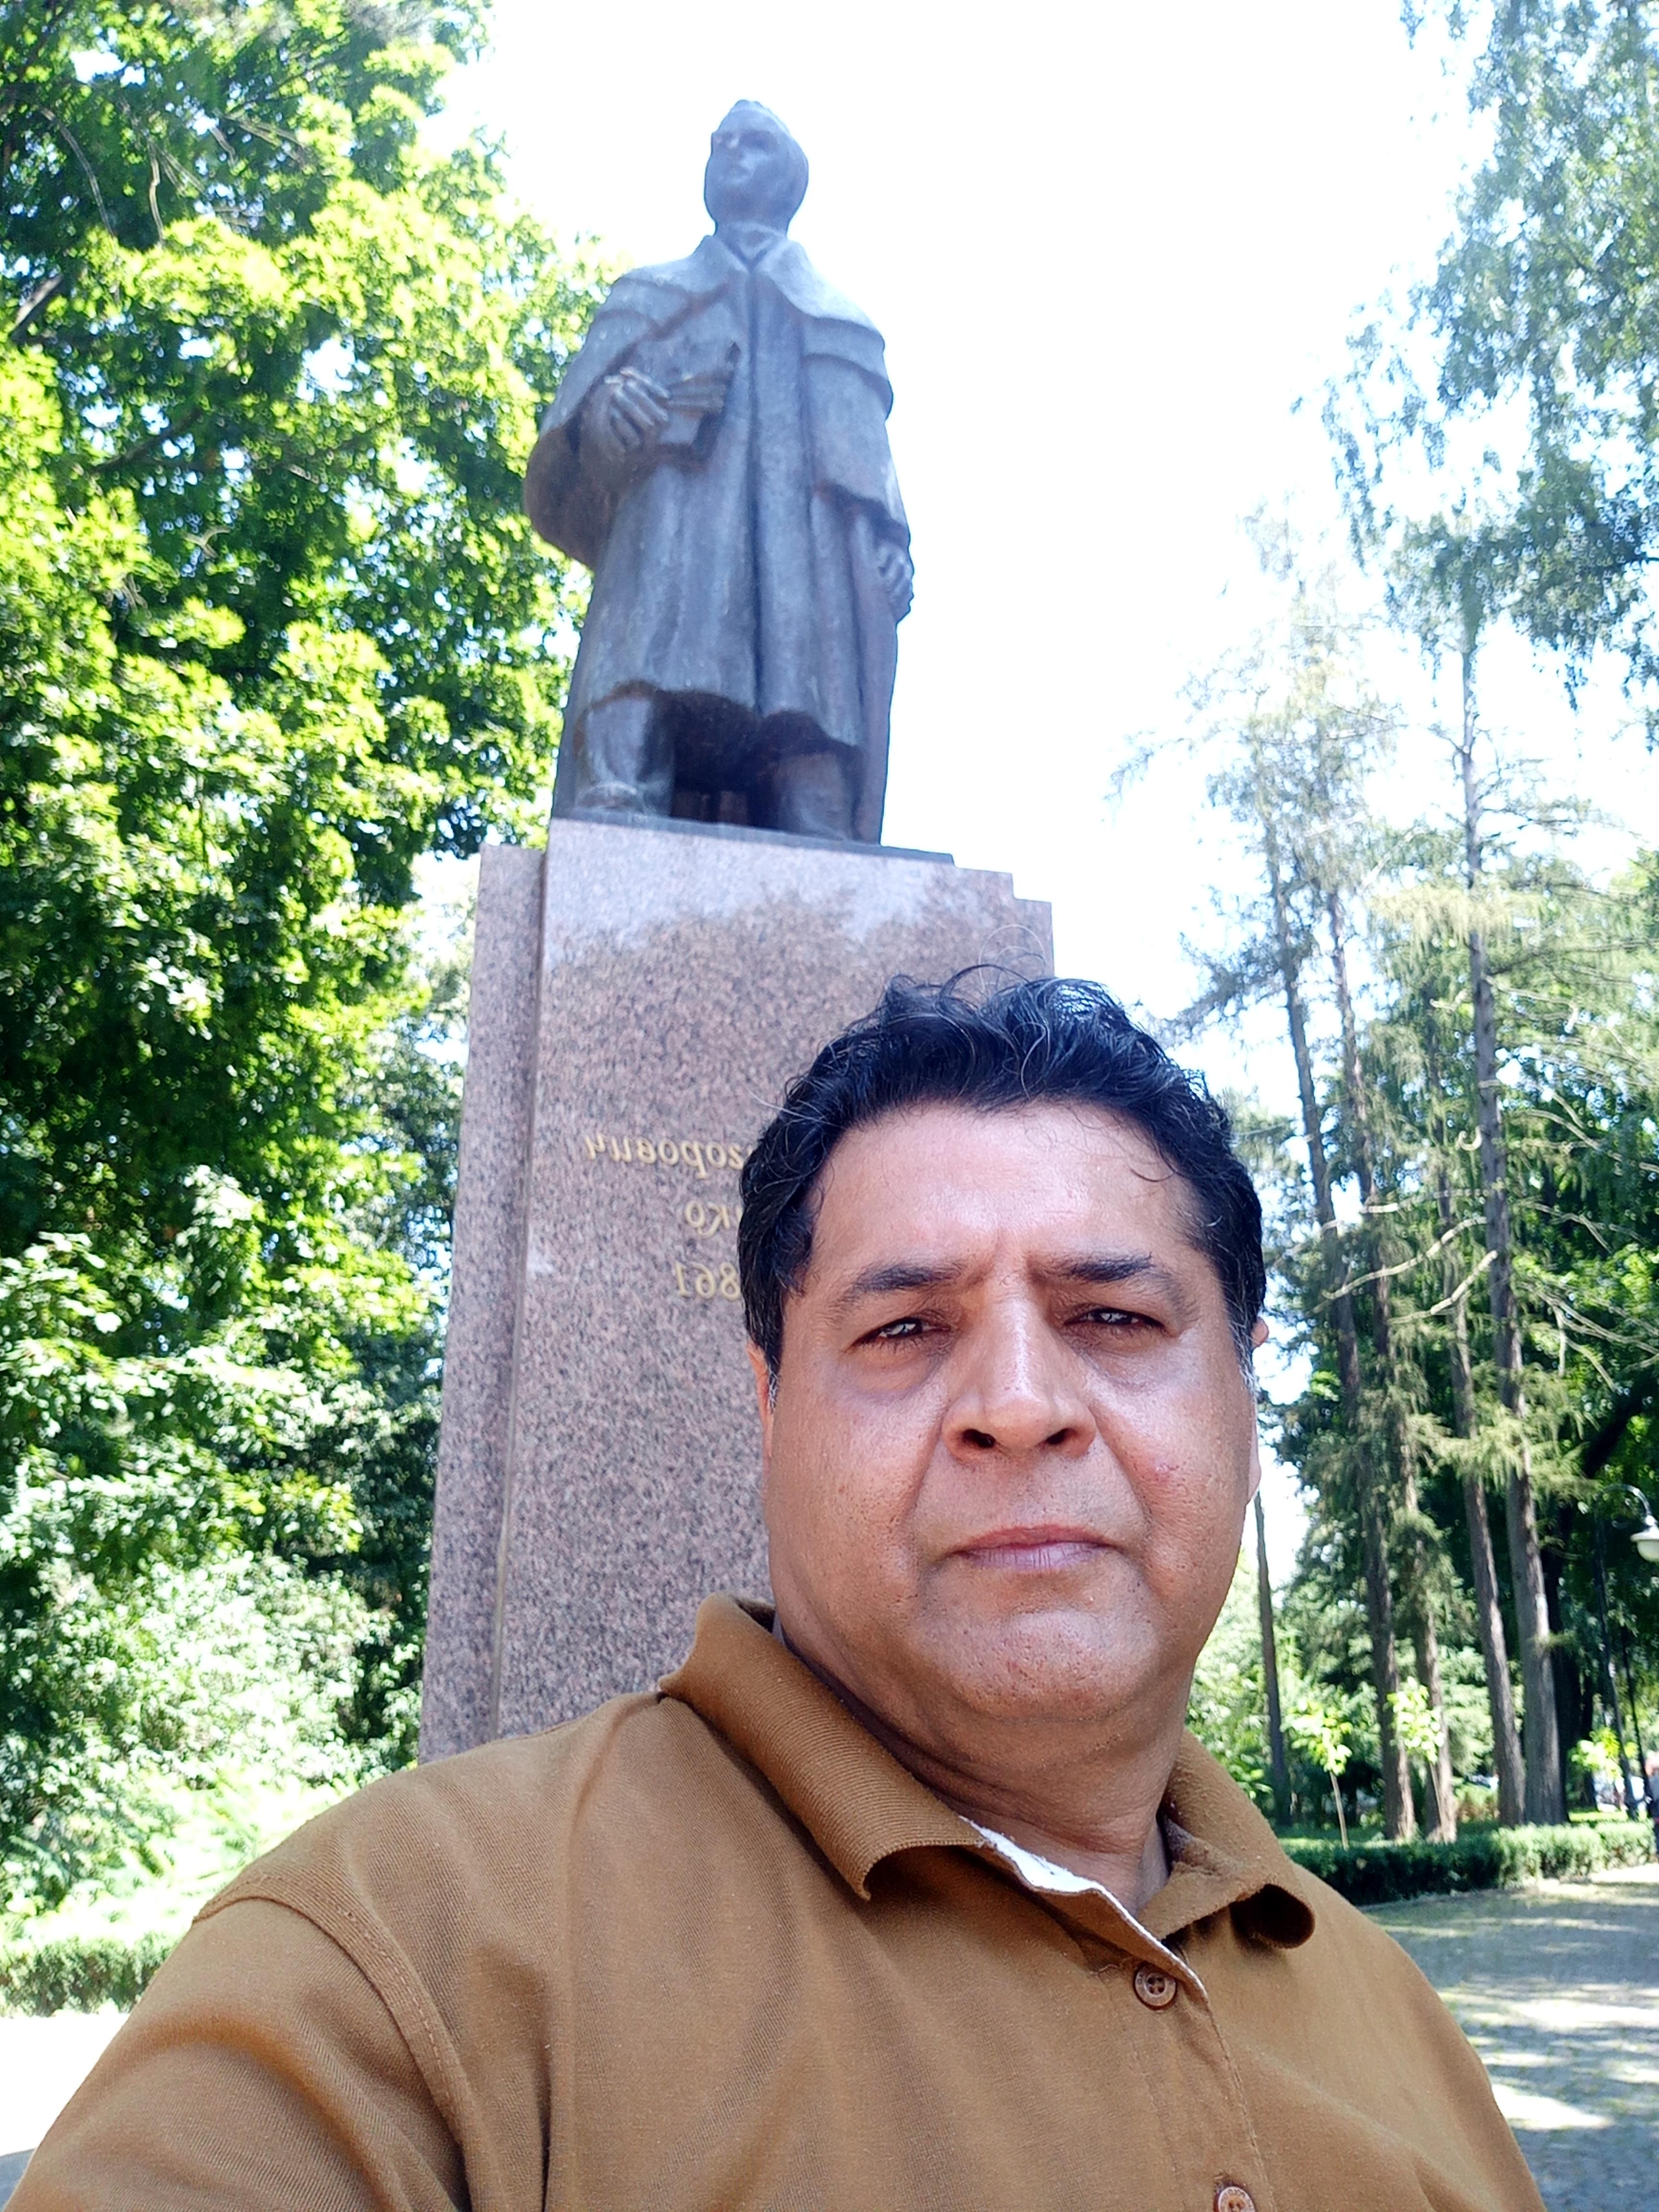 I wished to meet Taras Shevchenko in Park named after him. Taras Shevchenko Park